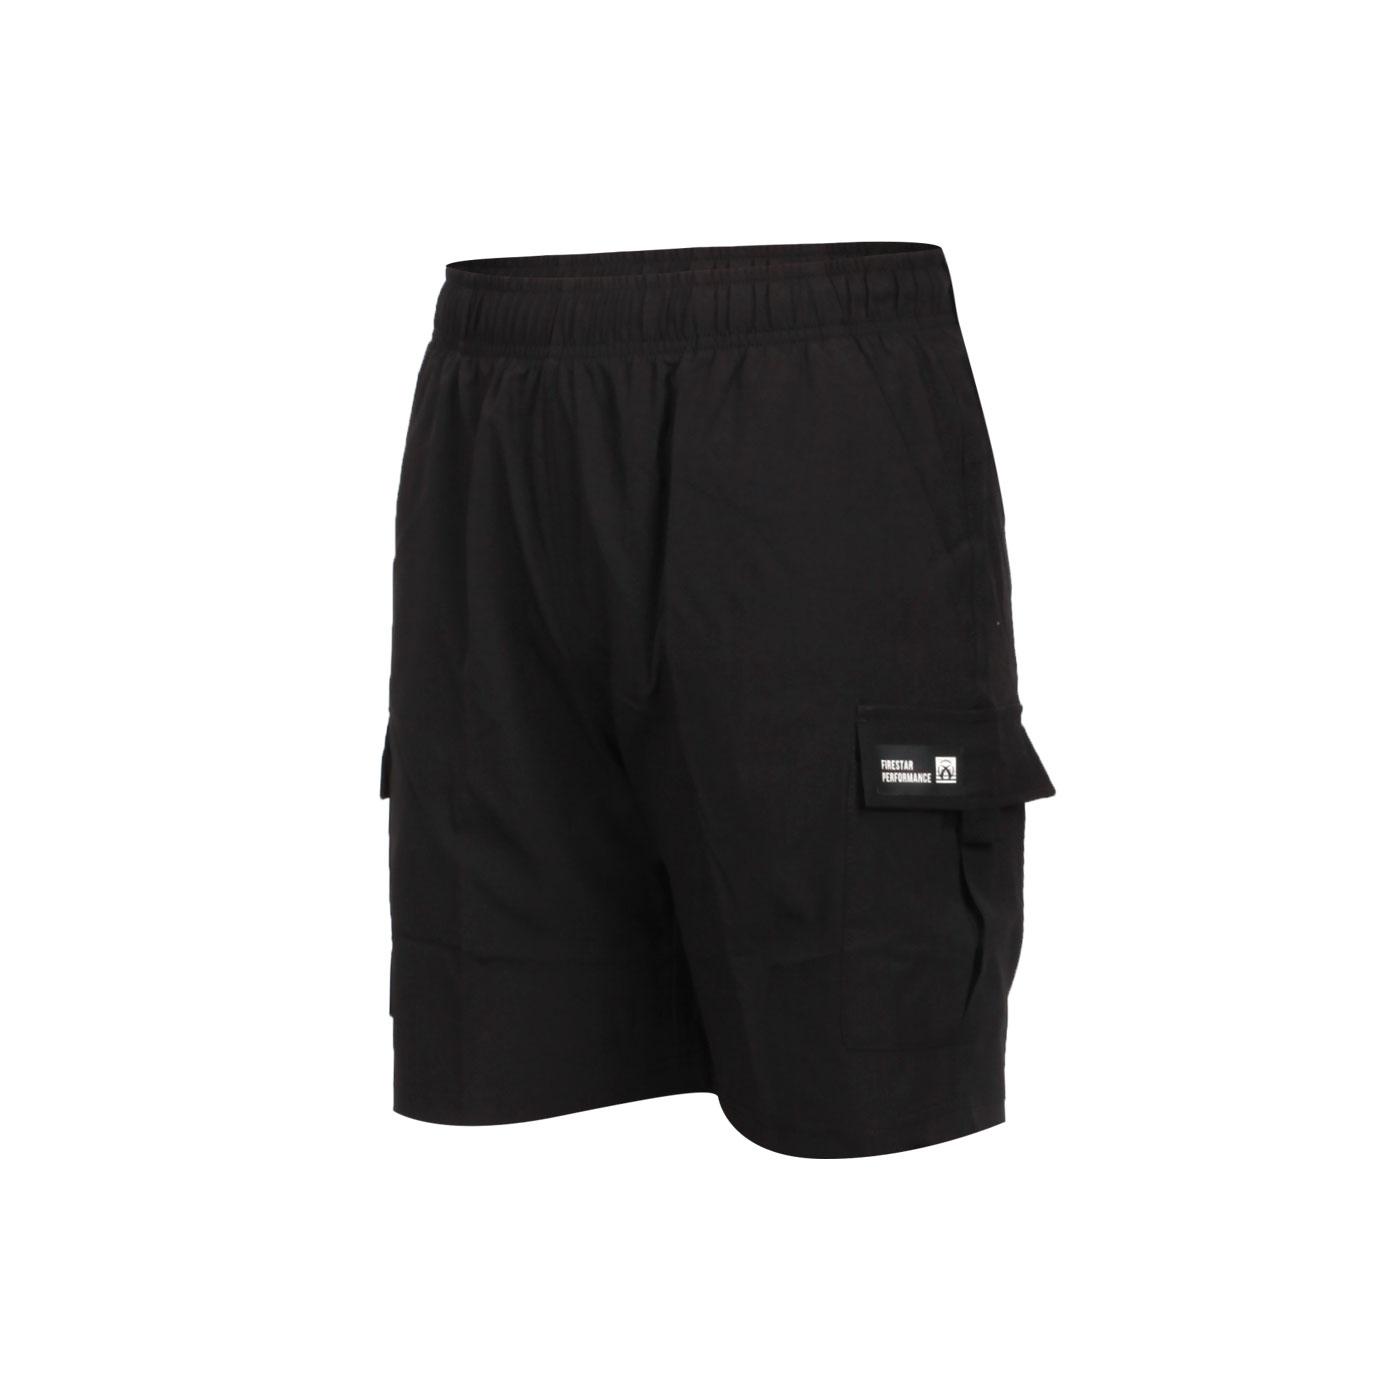 FIRESTAR 女款彈性多口袋短褲 CL027-10 - 黑